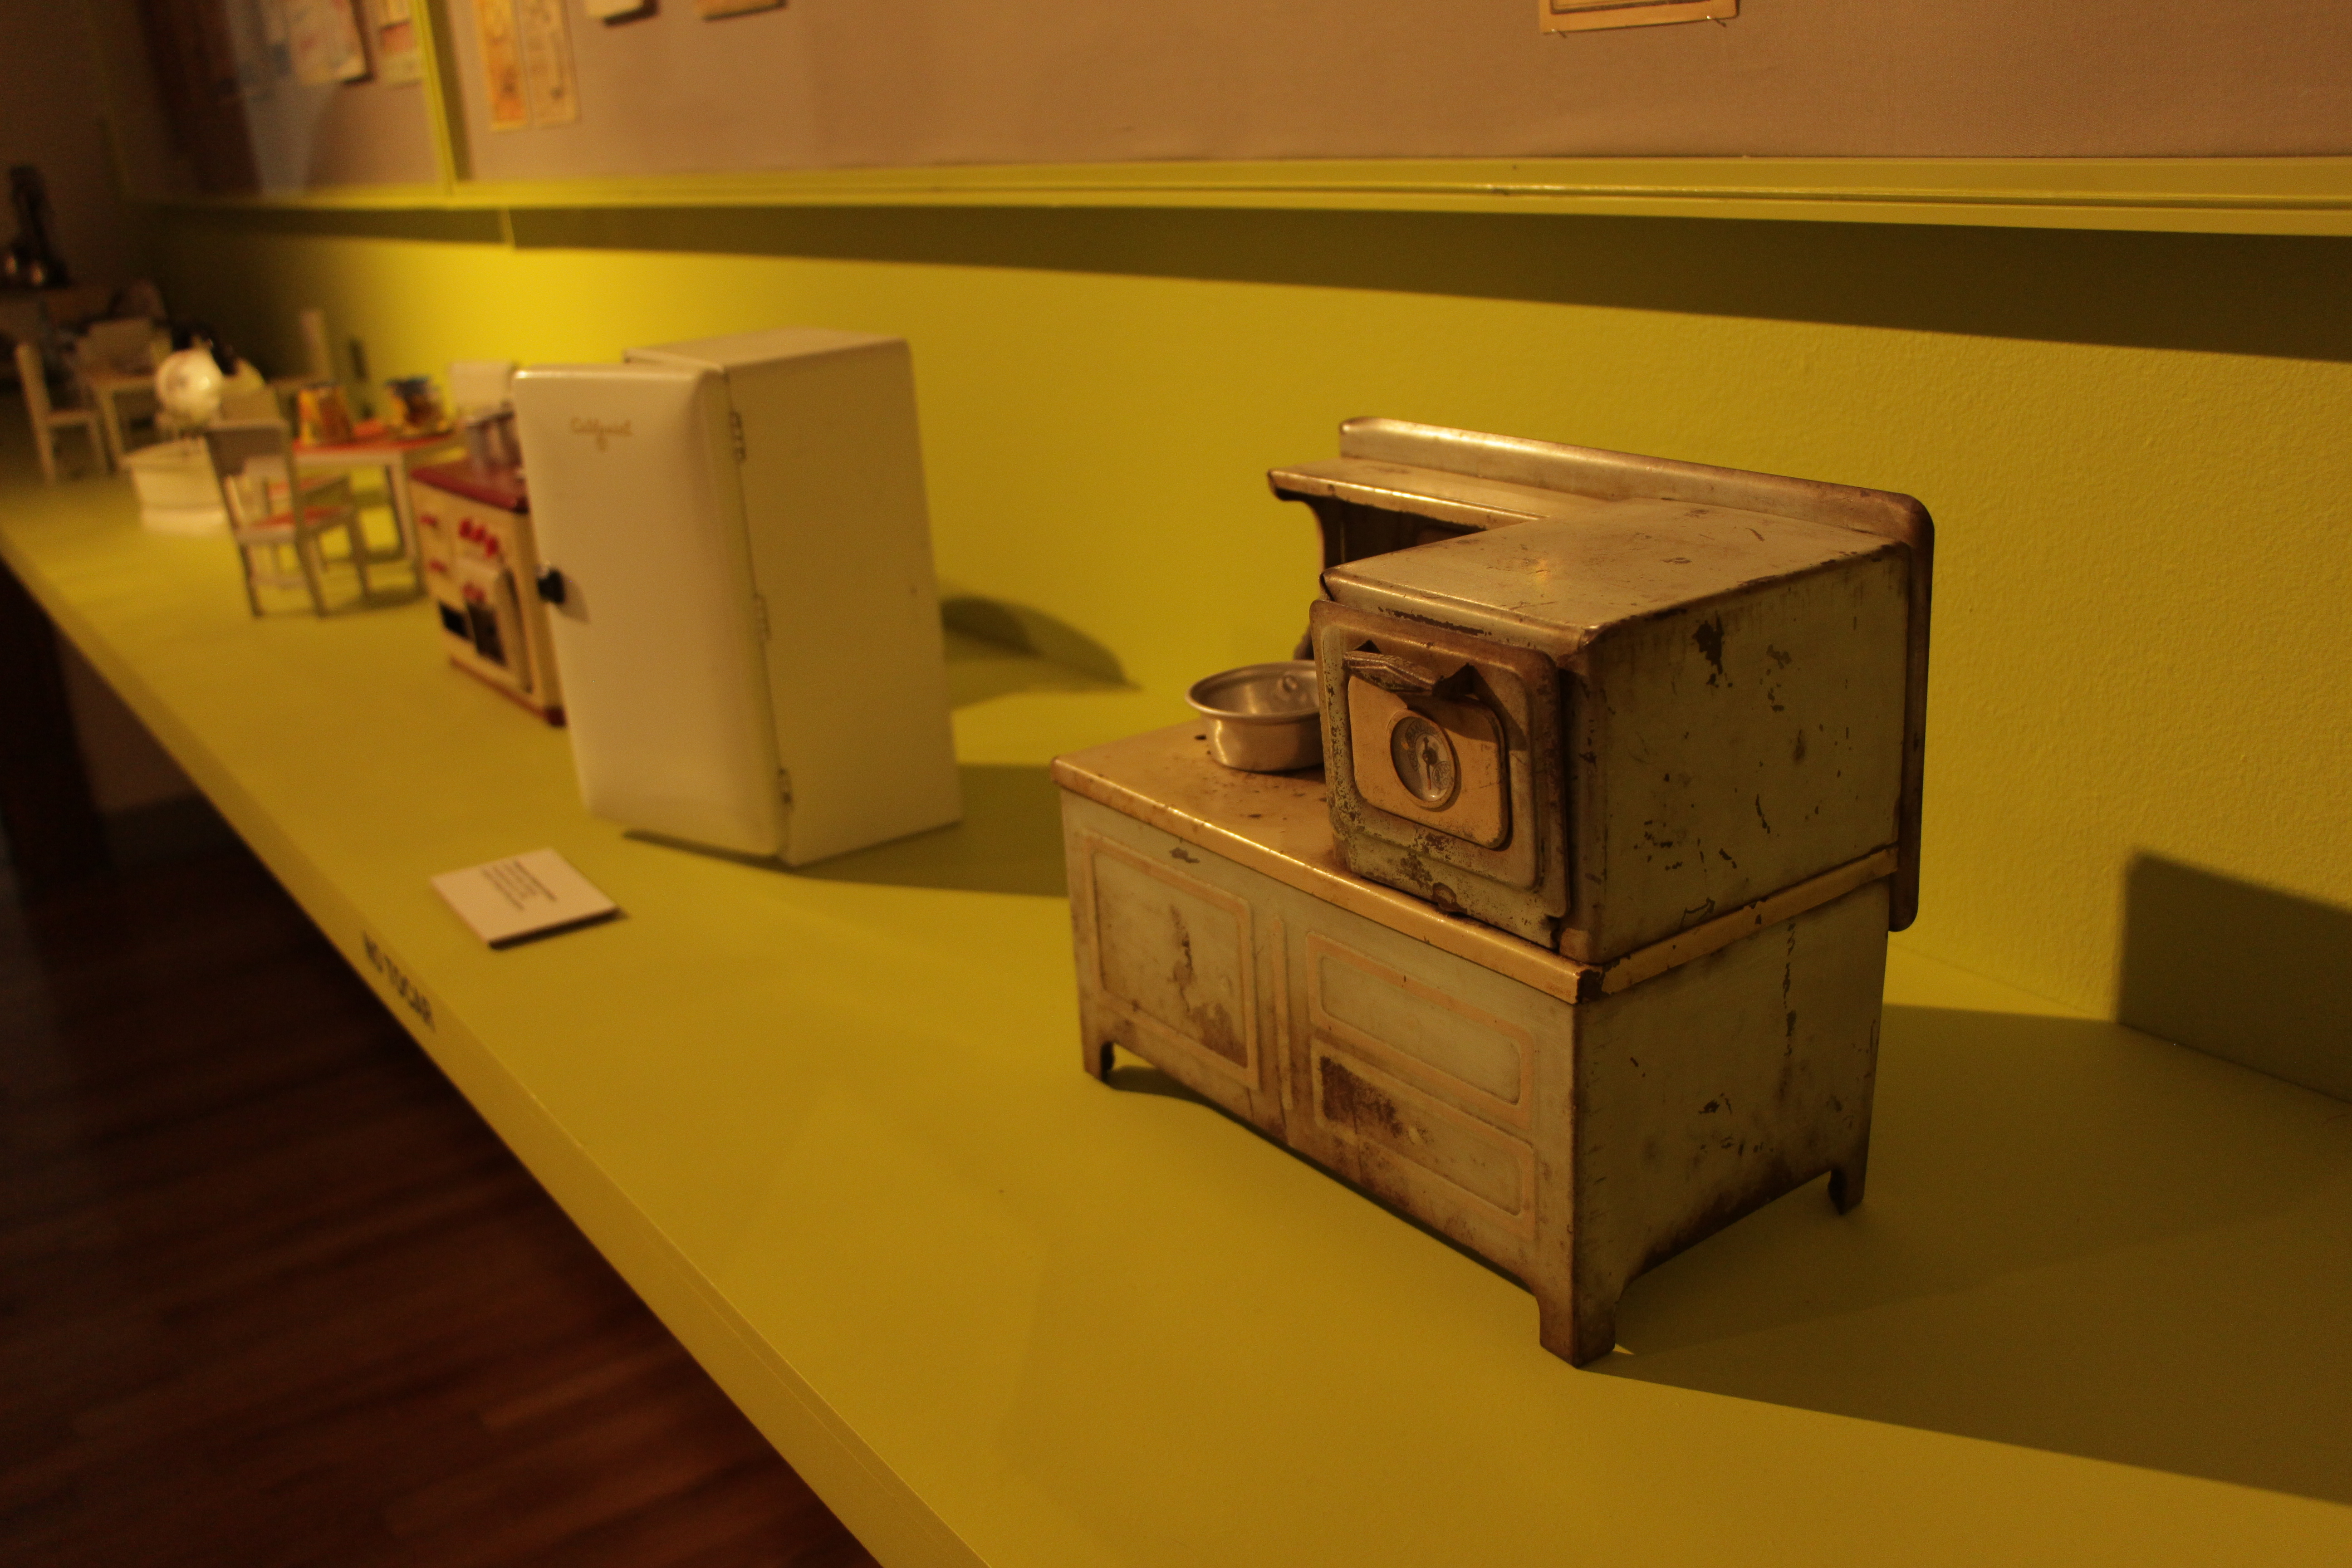 File:Miniature Kitchen Furniture At The MODO Museum